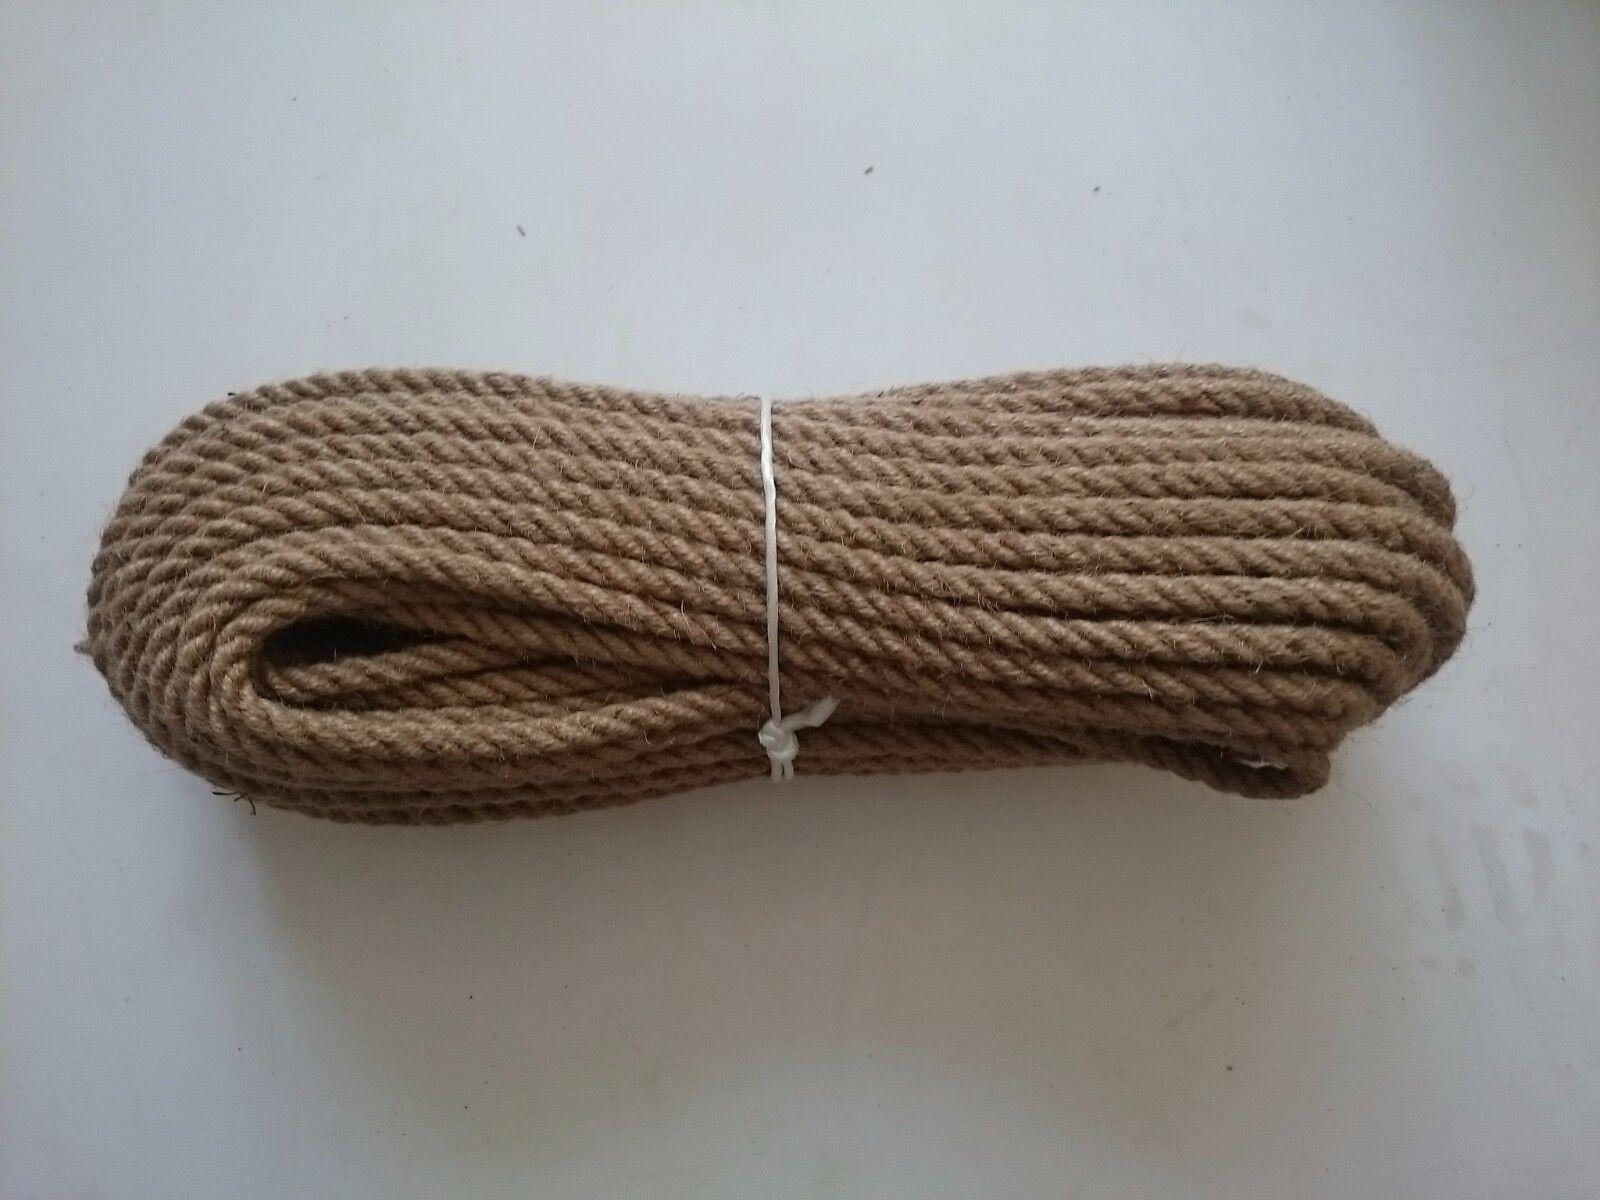 1,89 -  /m Juteseil 28 mm 30 Jute Seil Seil Jute Rope 1 - 30 mm m Natur 028119